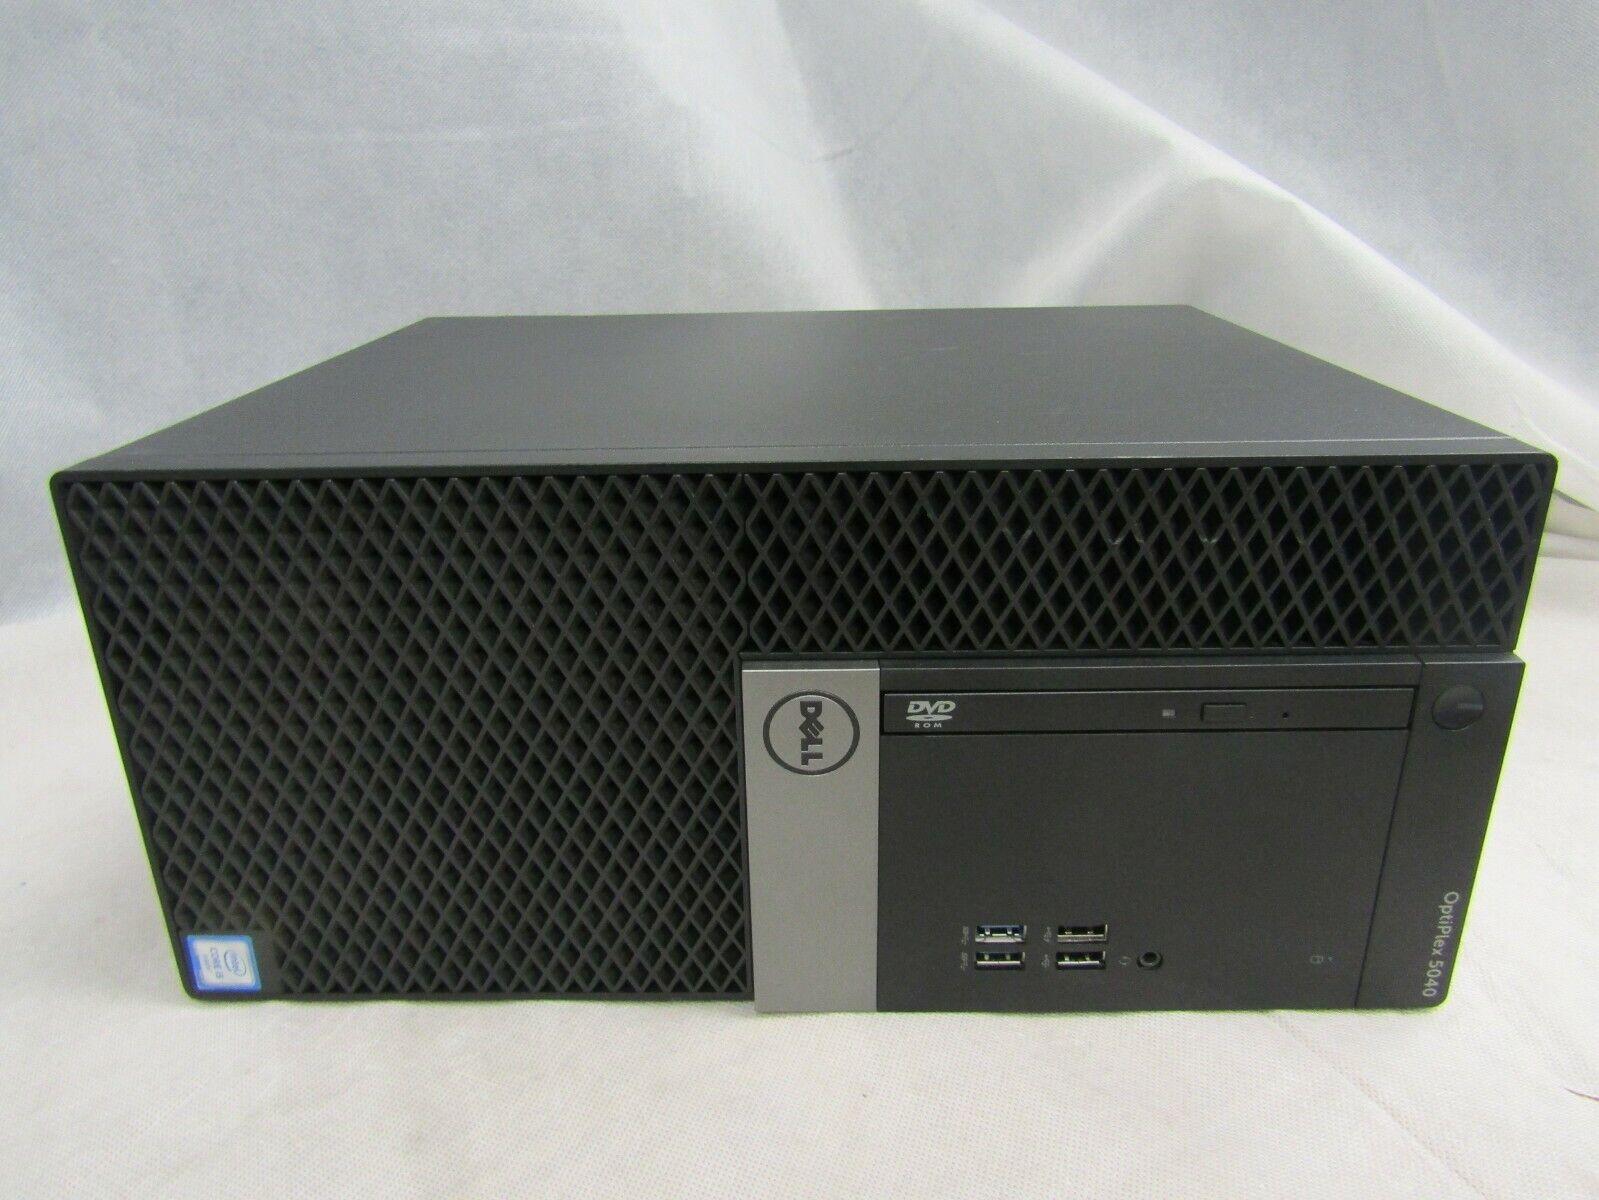 Dell OptiPlex 5040 Mini Tower Intel i3-6100 8GB RAM 128 SSD Windows 10 Pro. Buy it now for 155.10